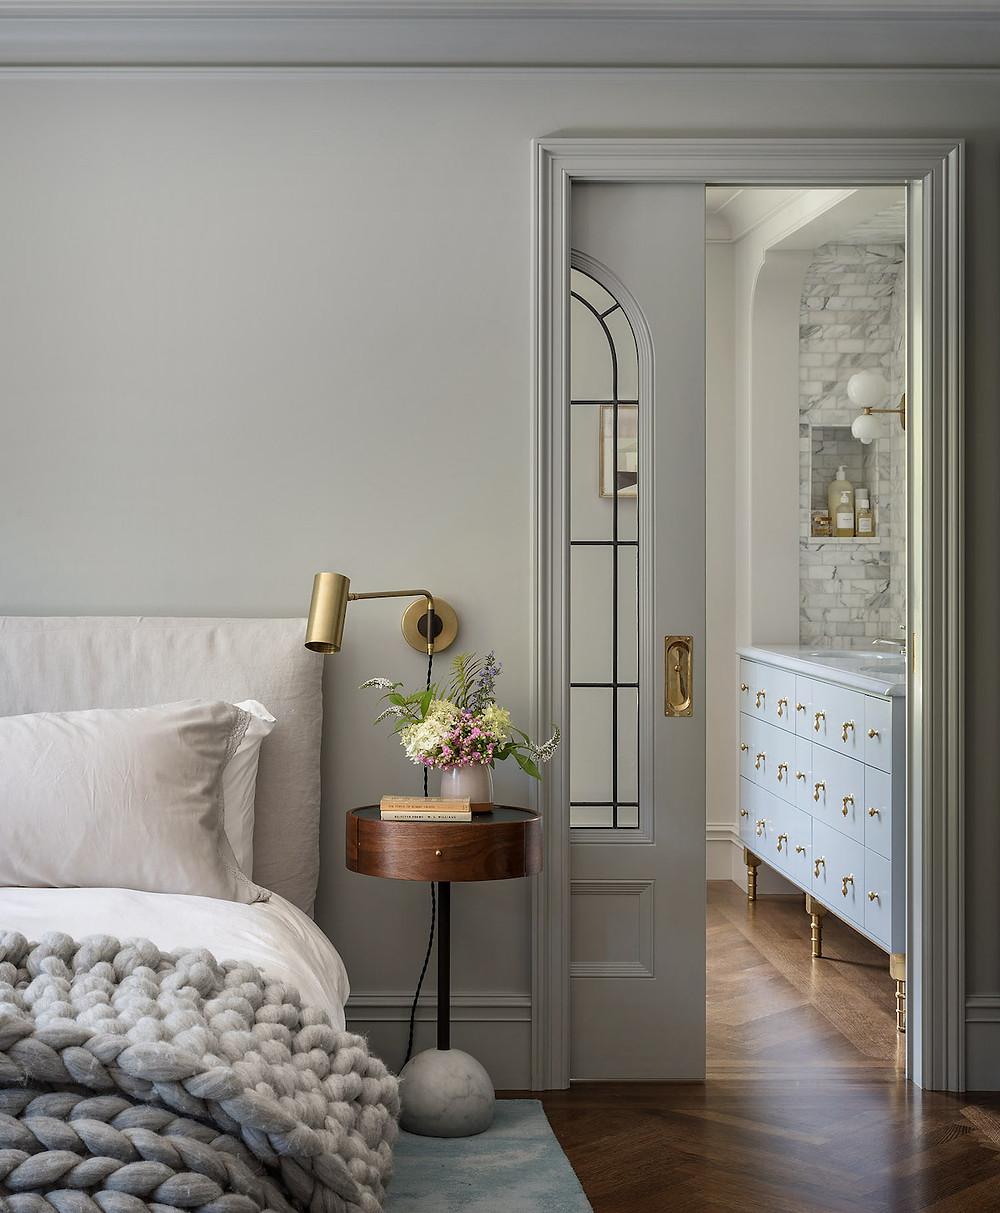 gray bedroom pocket door to bathroom storage vanity bed with chunky knit blanket globe light